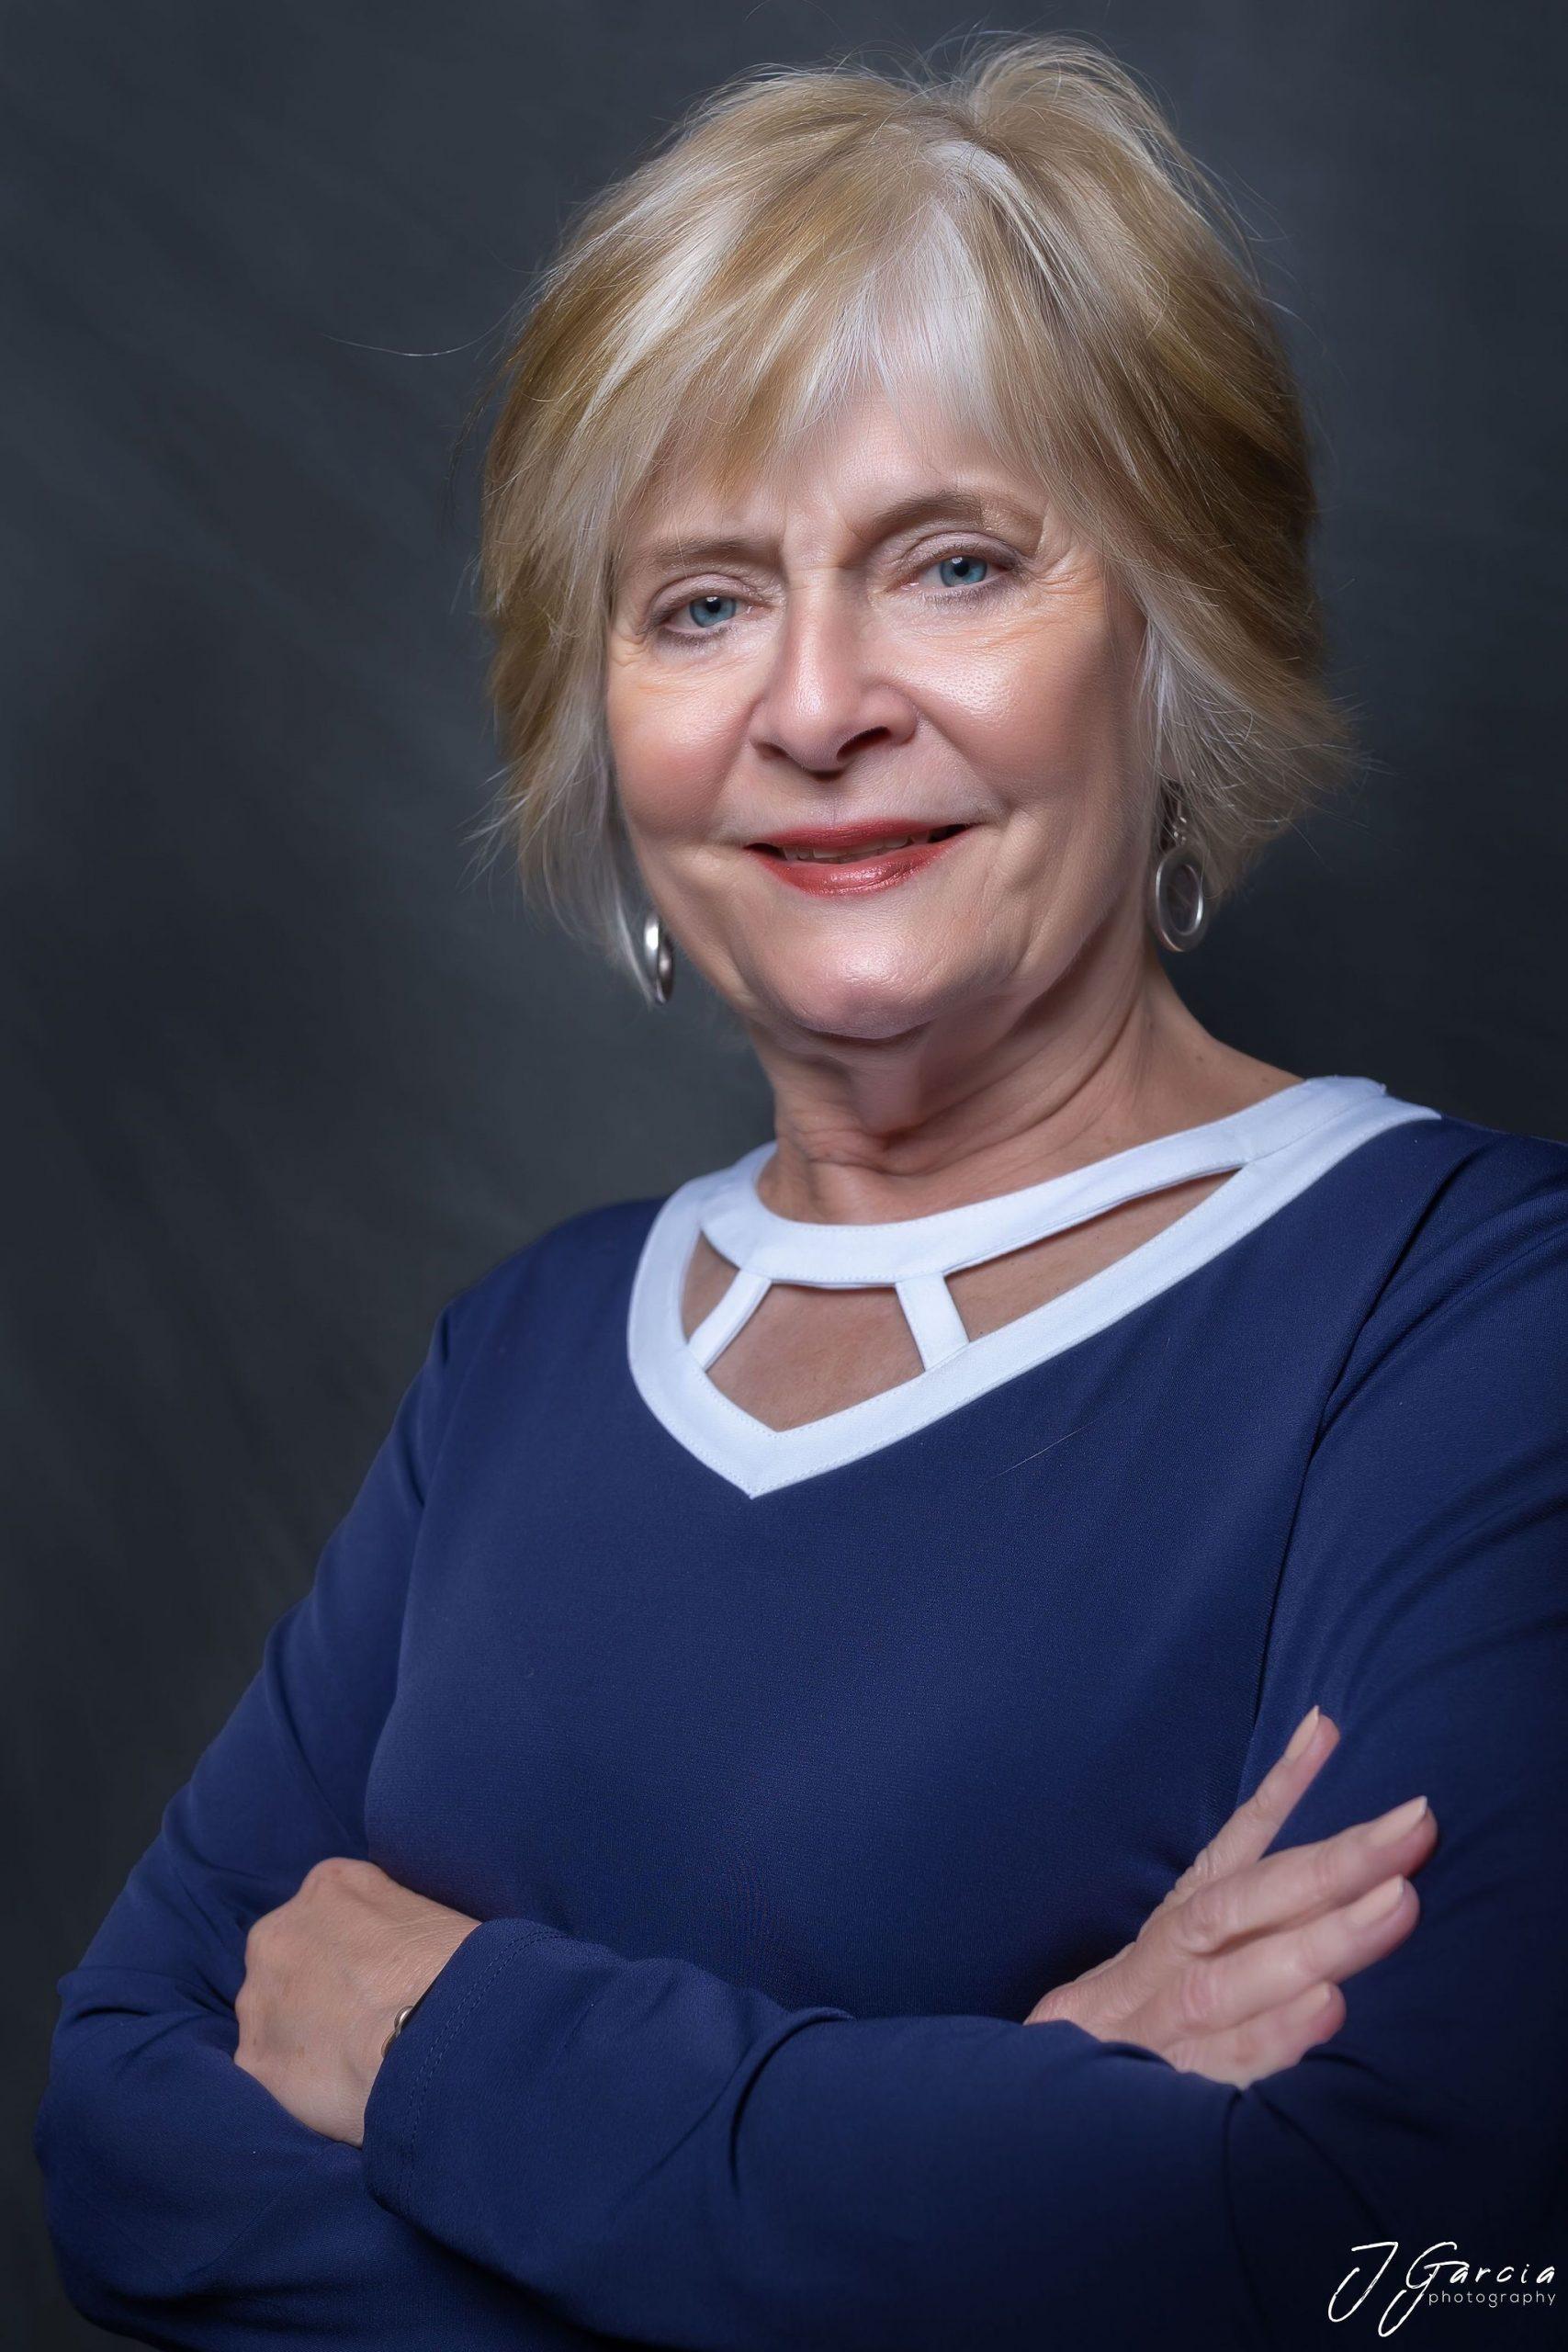 Sandra S. Dartus, CFEE Nonprofit Marketing & Event Consultant, New Orleans, LA, USA